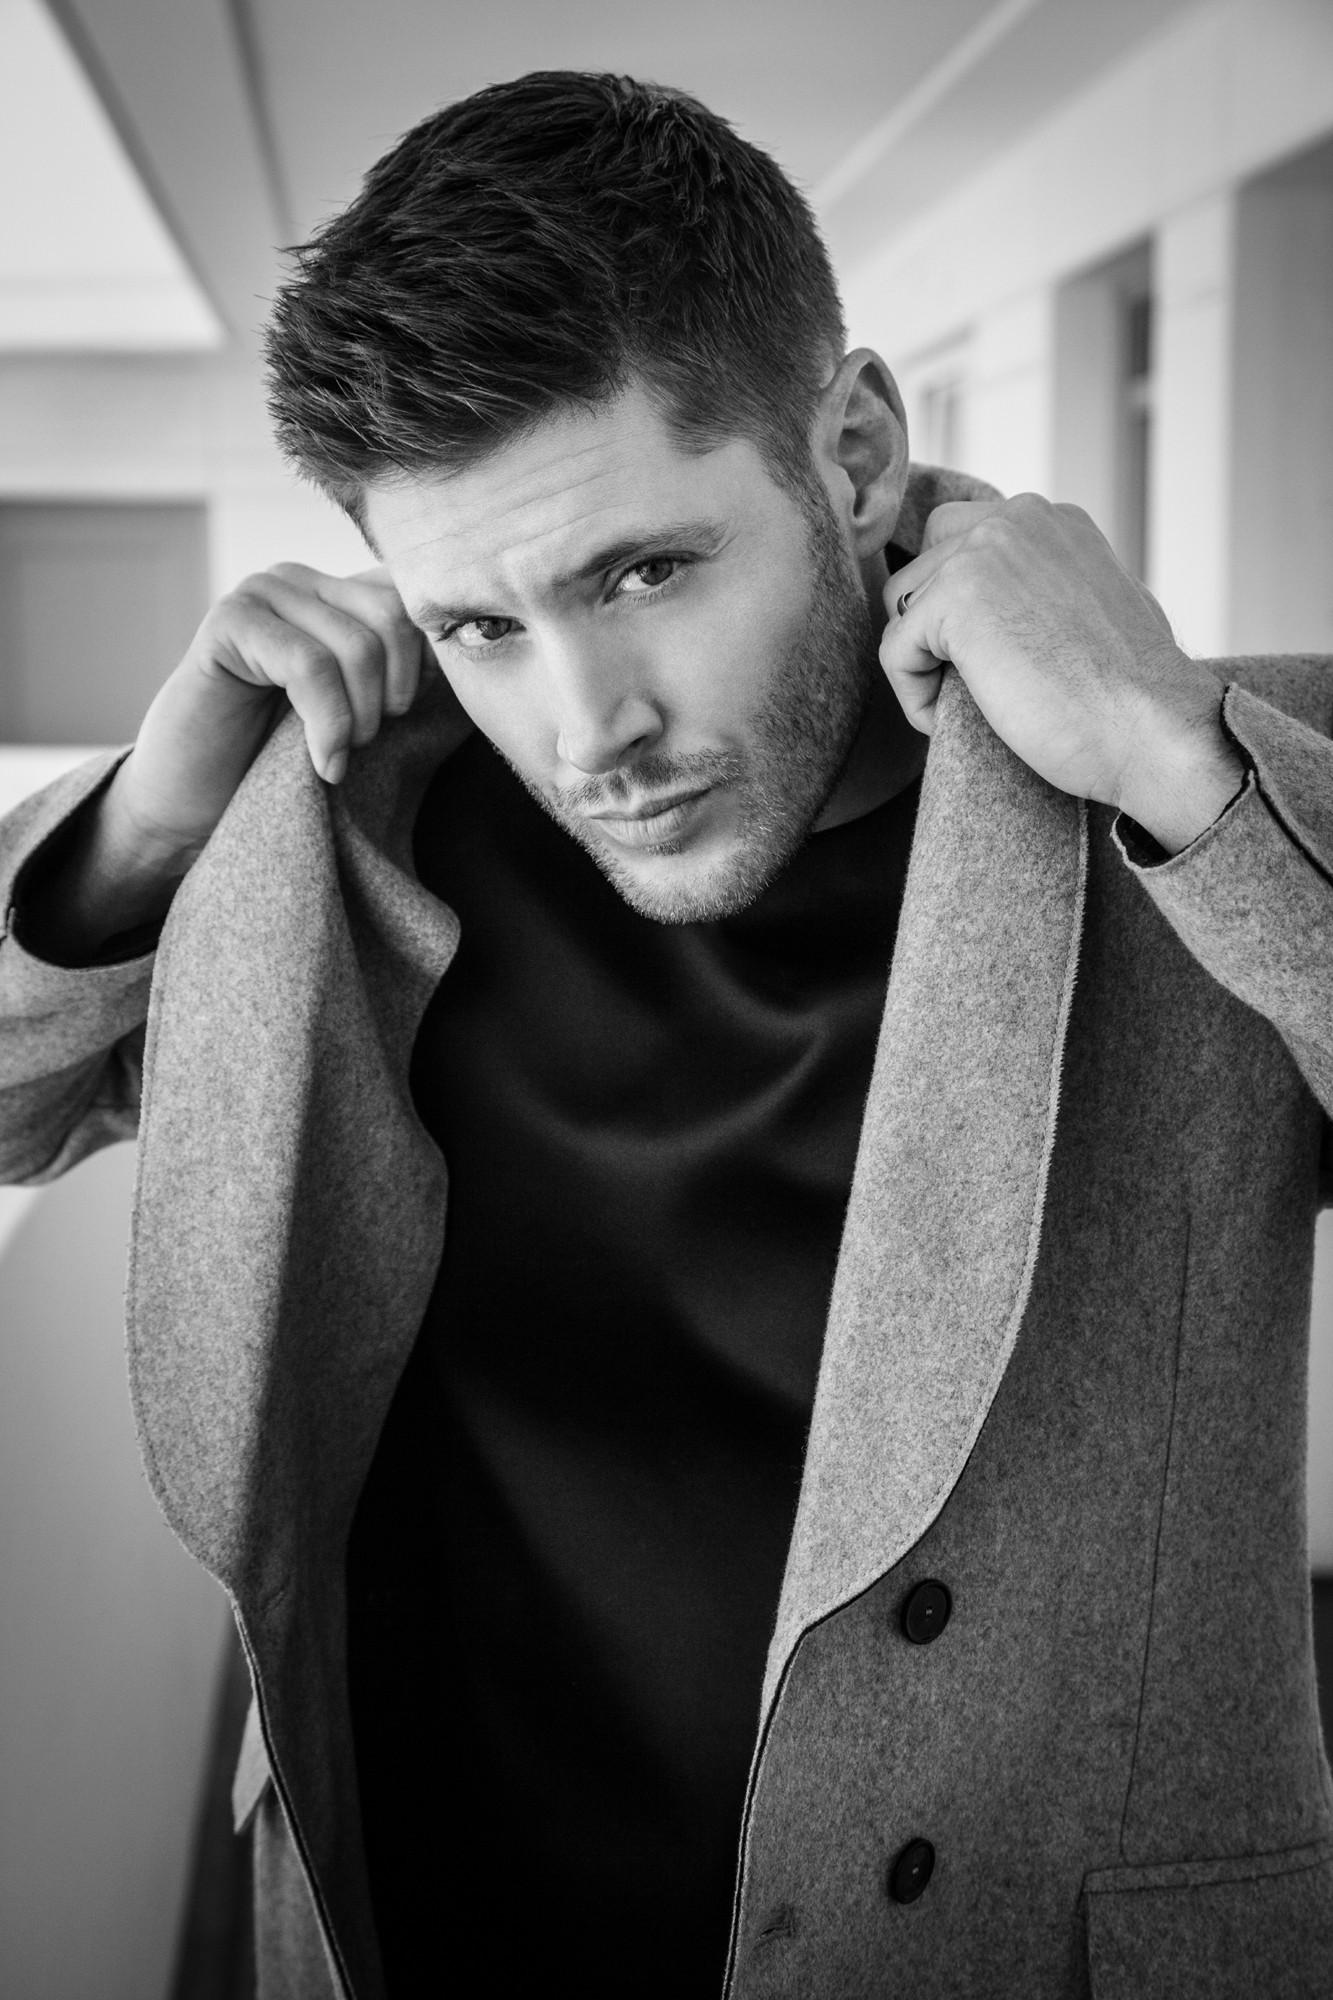 ДЖЕНСЕН ЭКЛЗ - Страница 6 Celeber-ru-Jensen-Ackles-Harper-s-Bazaar-CH-Magazine-Photoshoot-2014-04